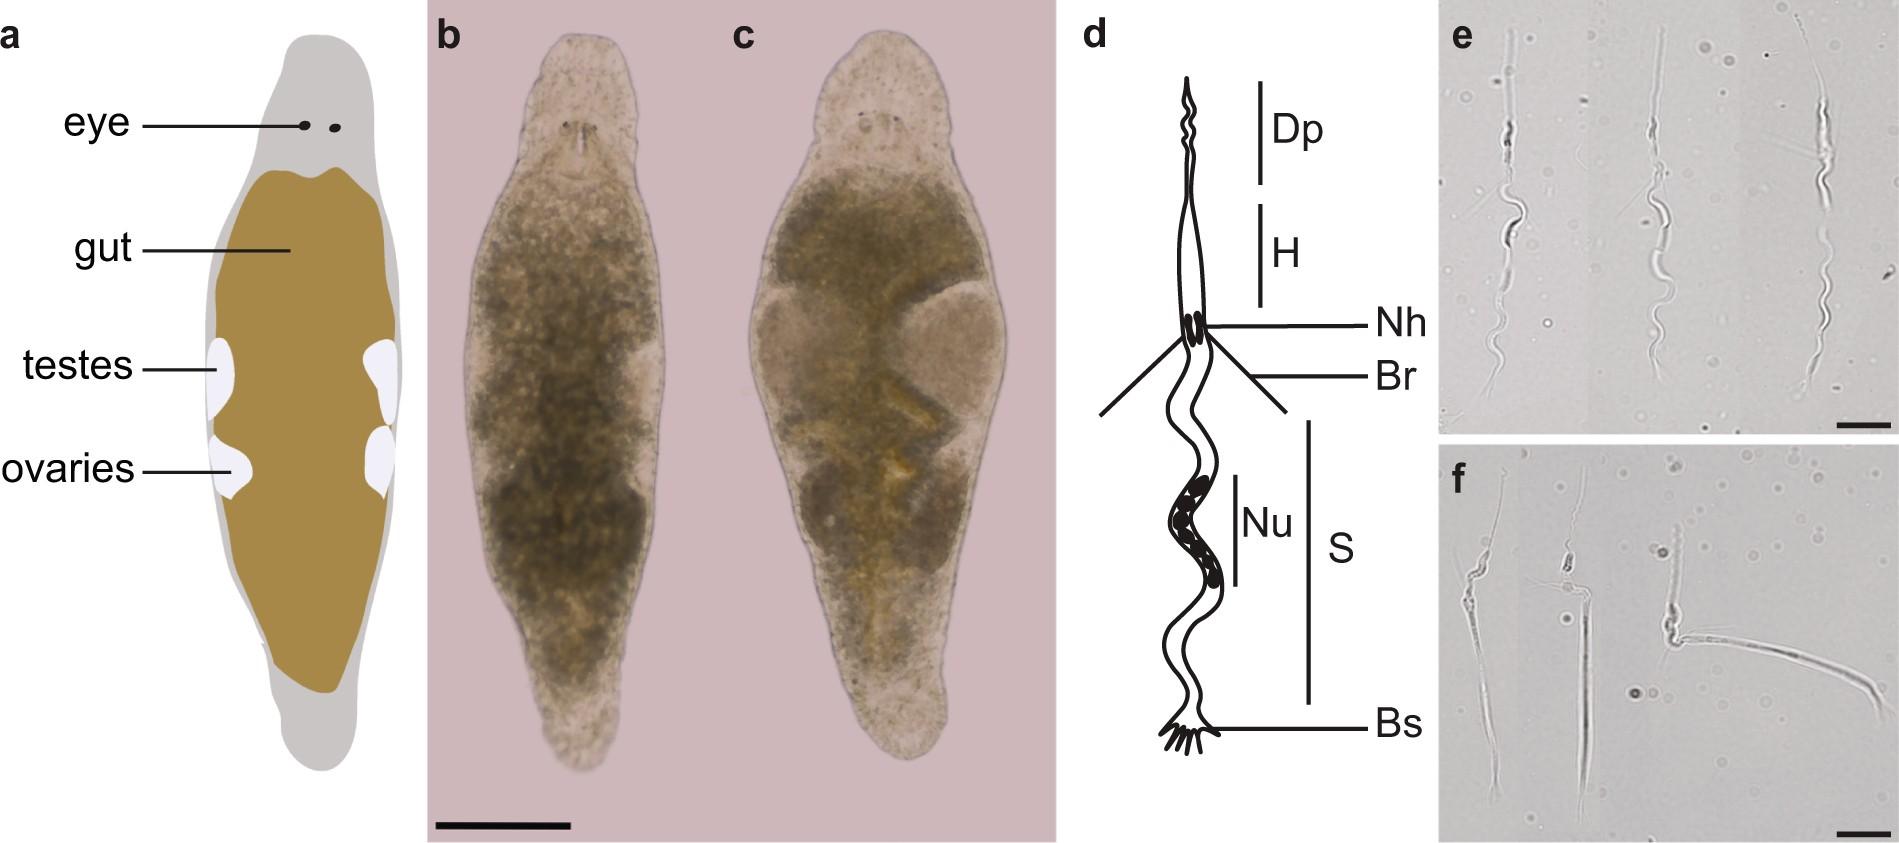 A Novel Flatworm Specific Gene Implicated In Reproduction Net Circuitdiagram Tda0161metaldetectorcircuitdiagram3192html Macrostomum Lignano Scientific Reports